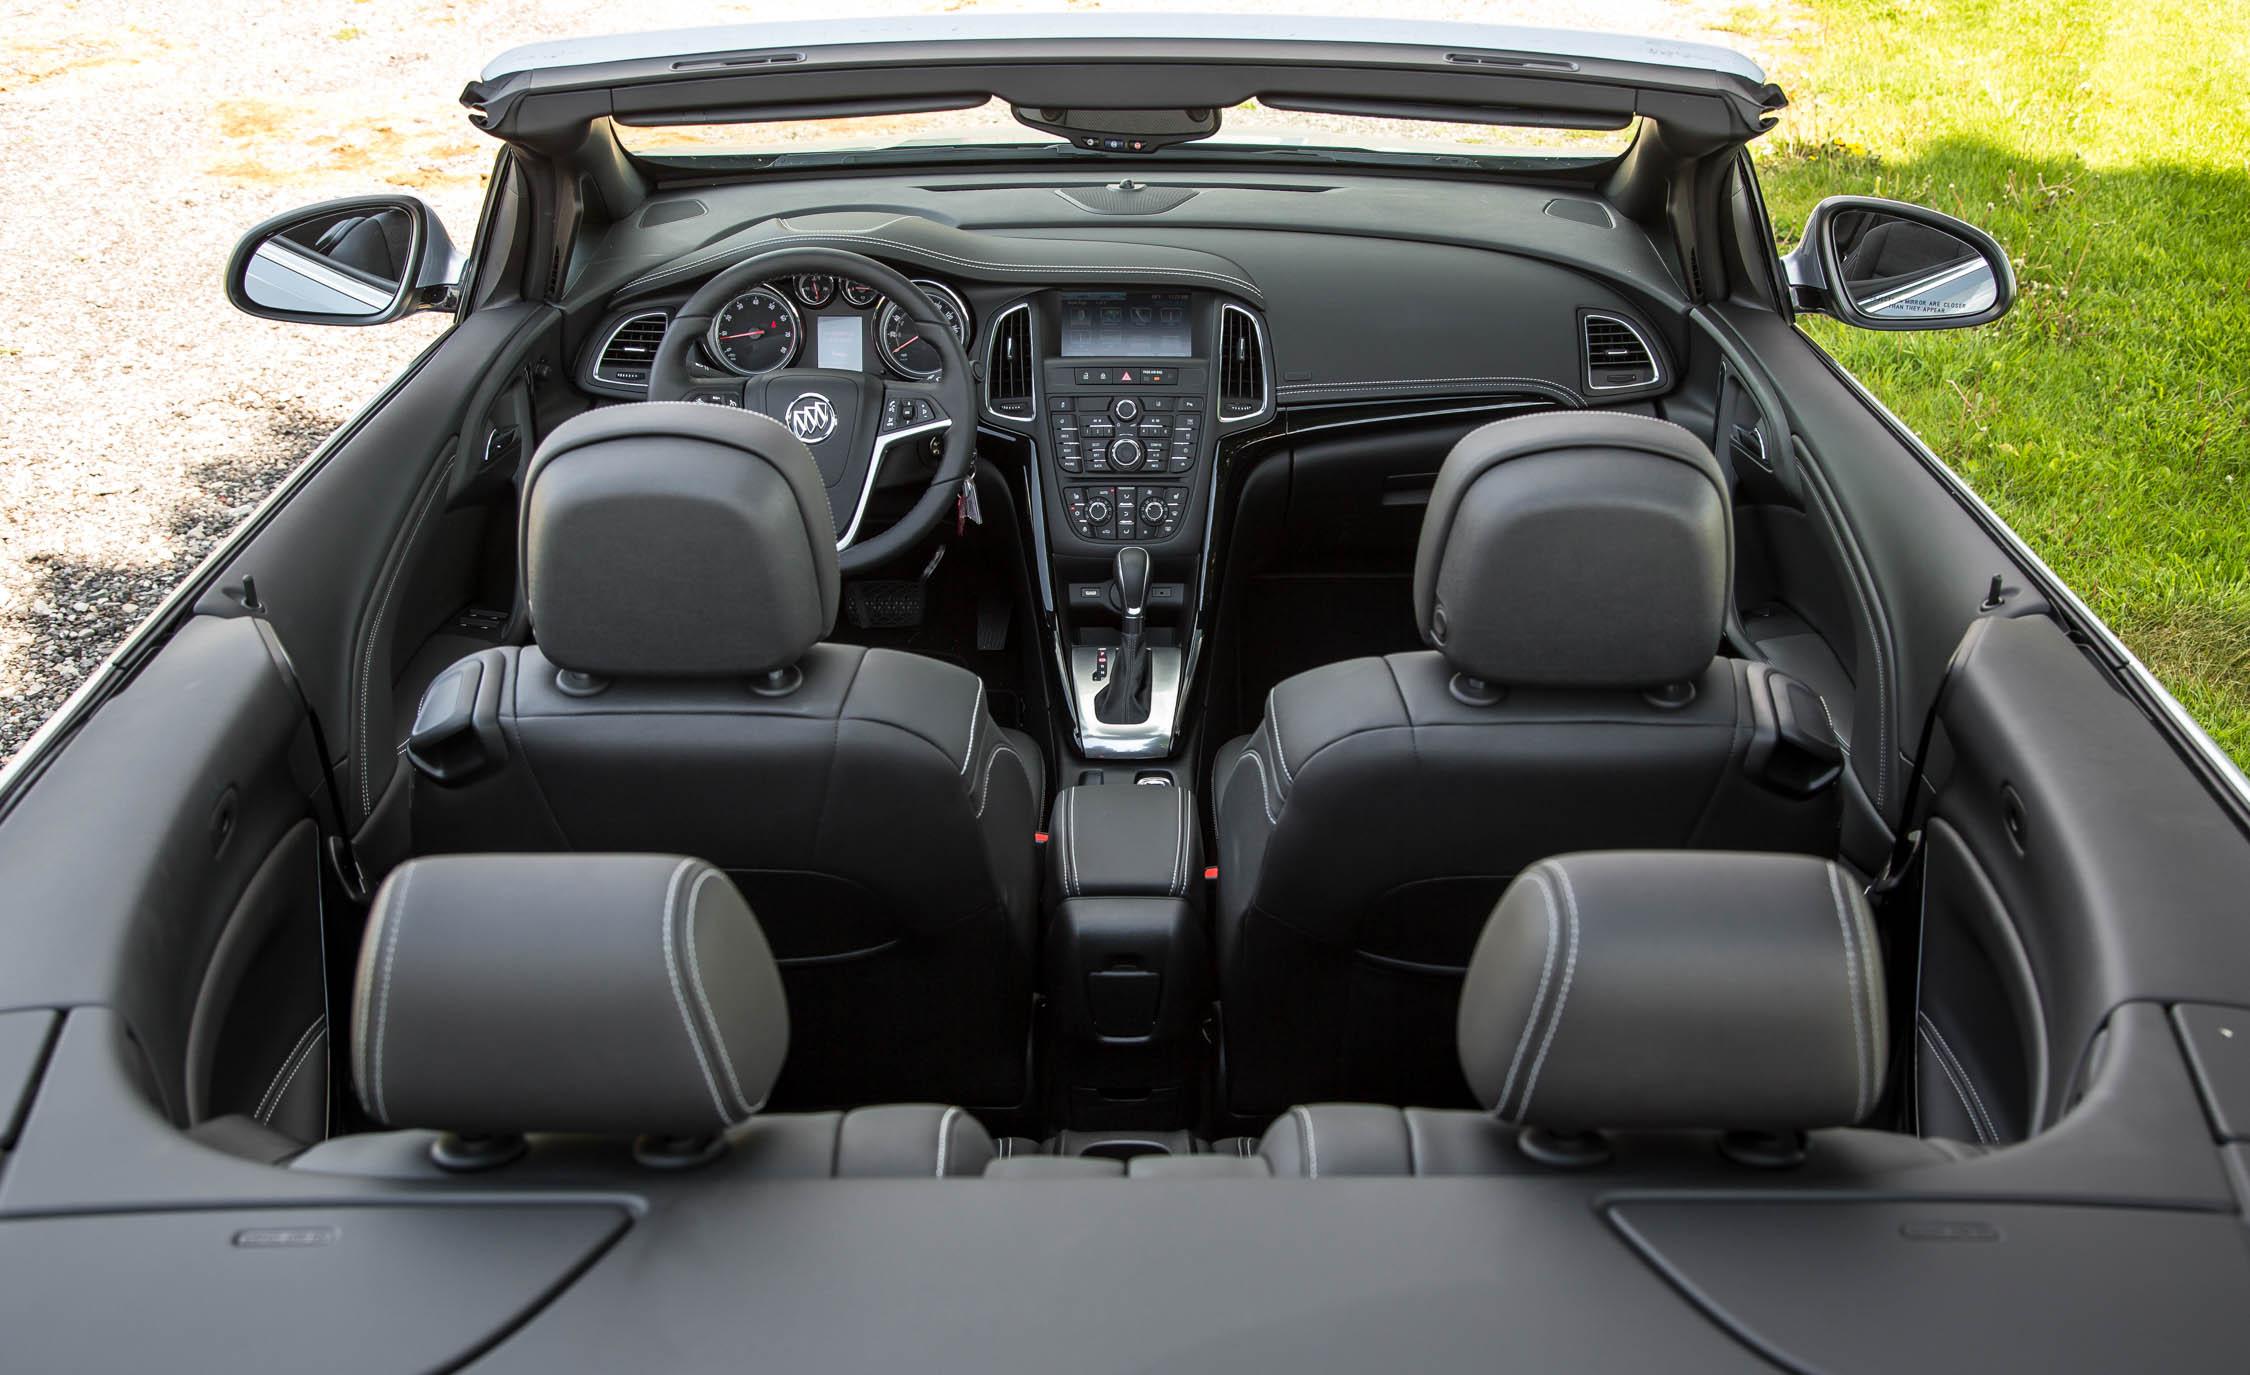 2016 Buick Cascada Premium (View 11 of 24)